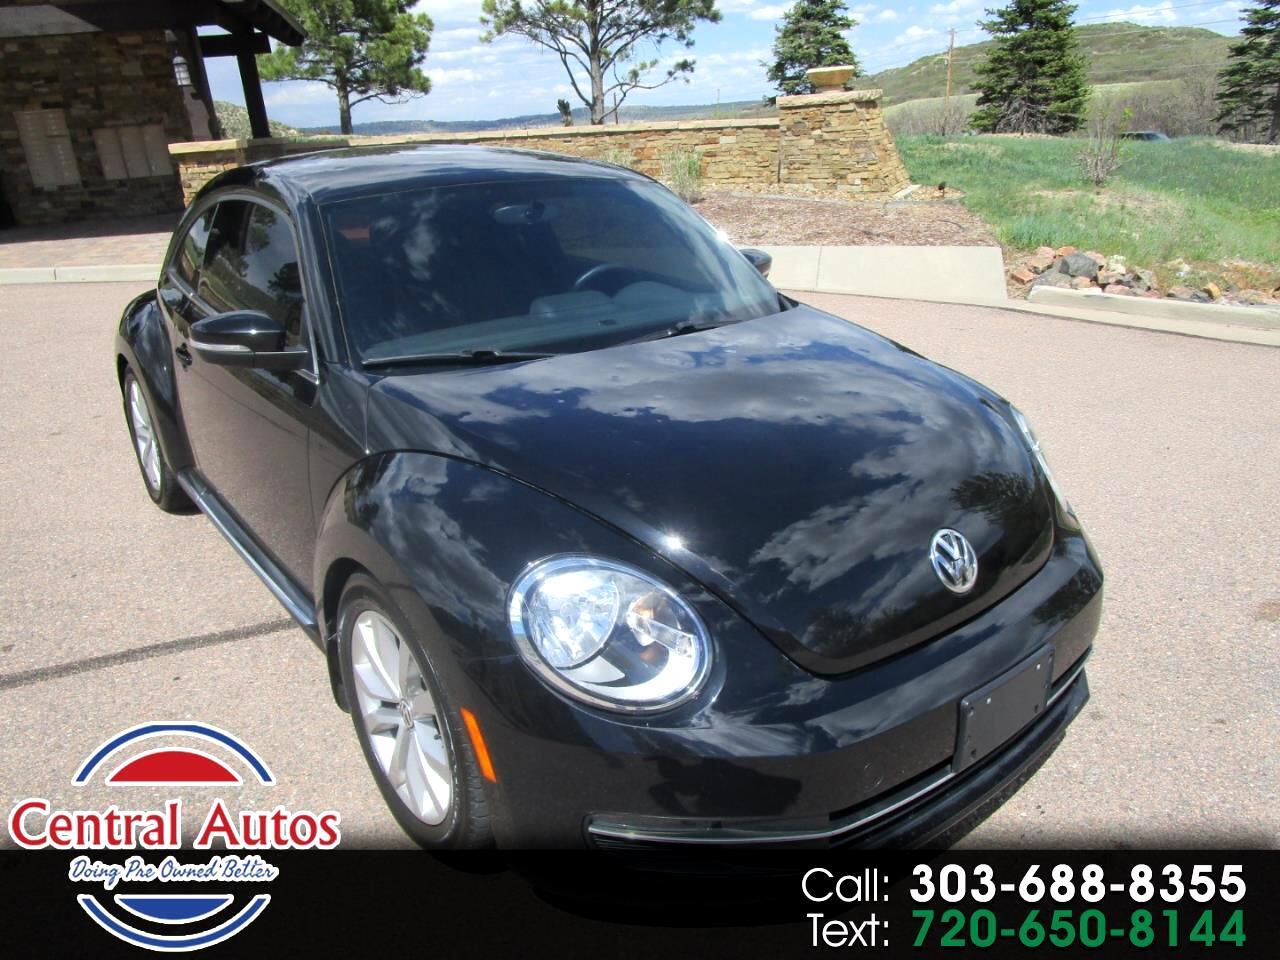 2014 Volkswagen Beetle Coupe 2dr Man 2.0L TDI